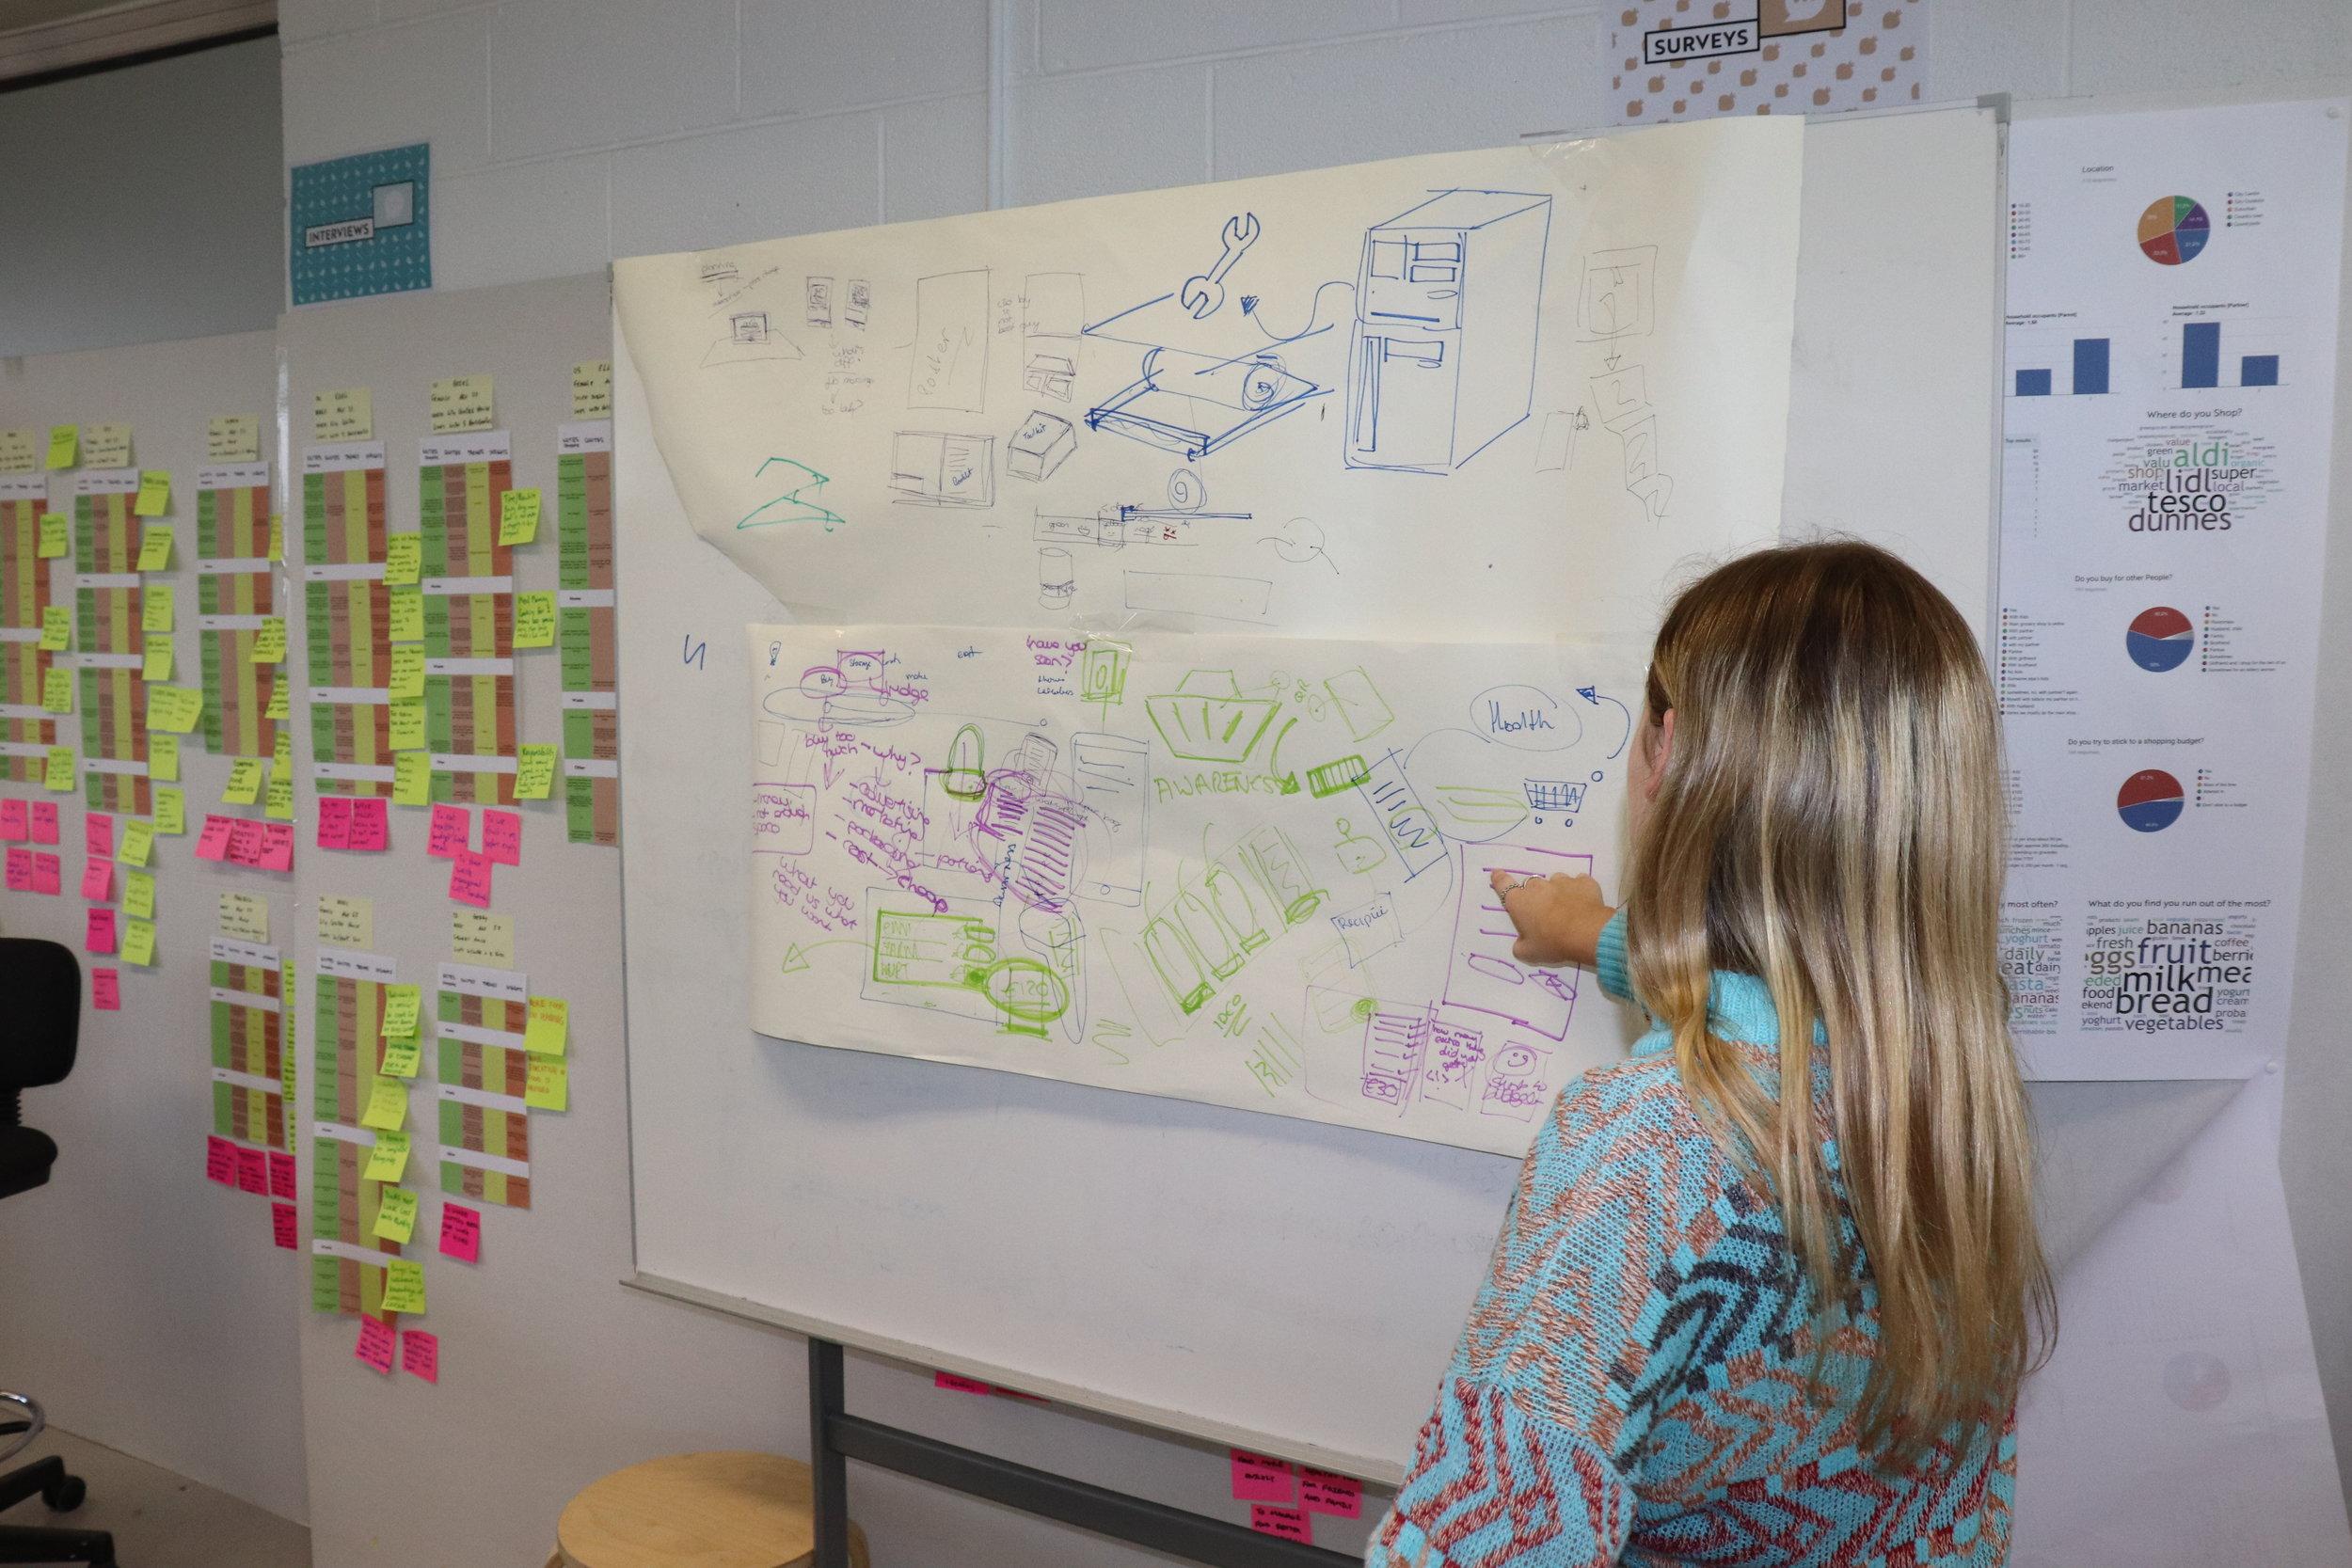 Rough concept brainstorming